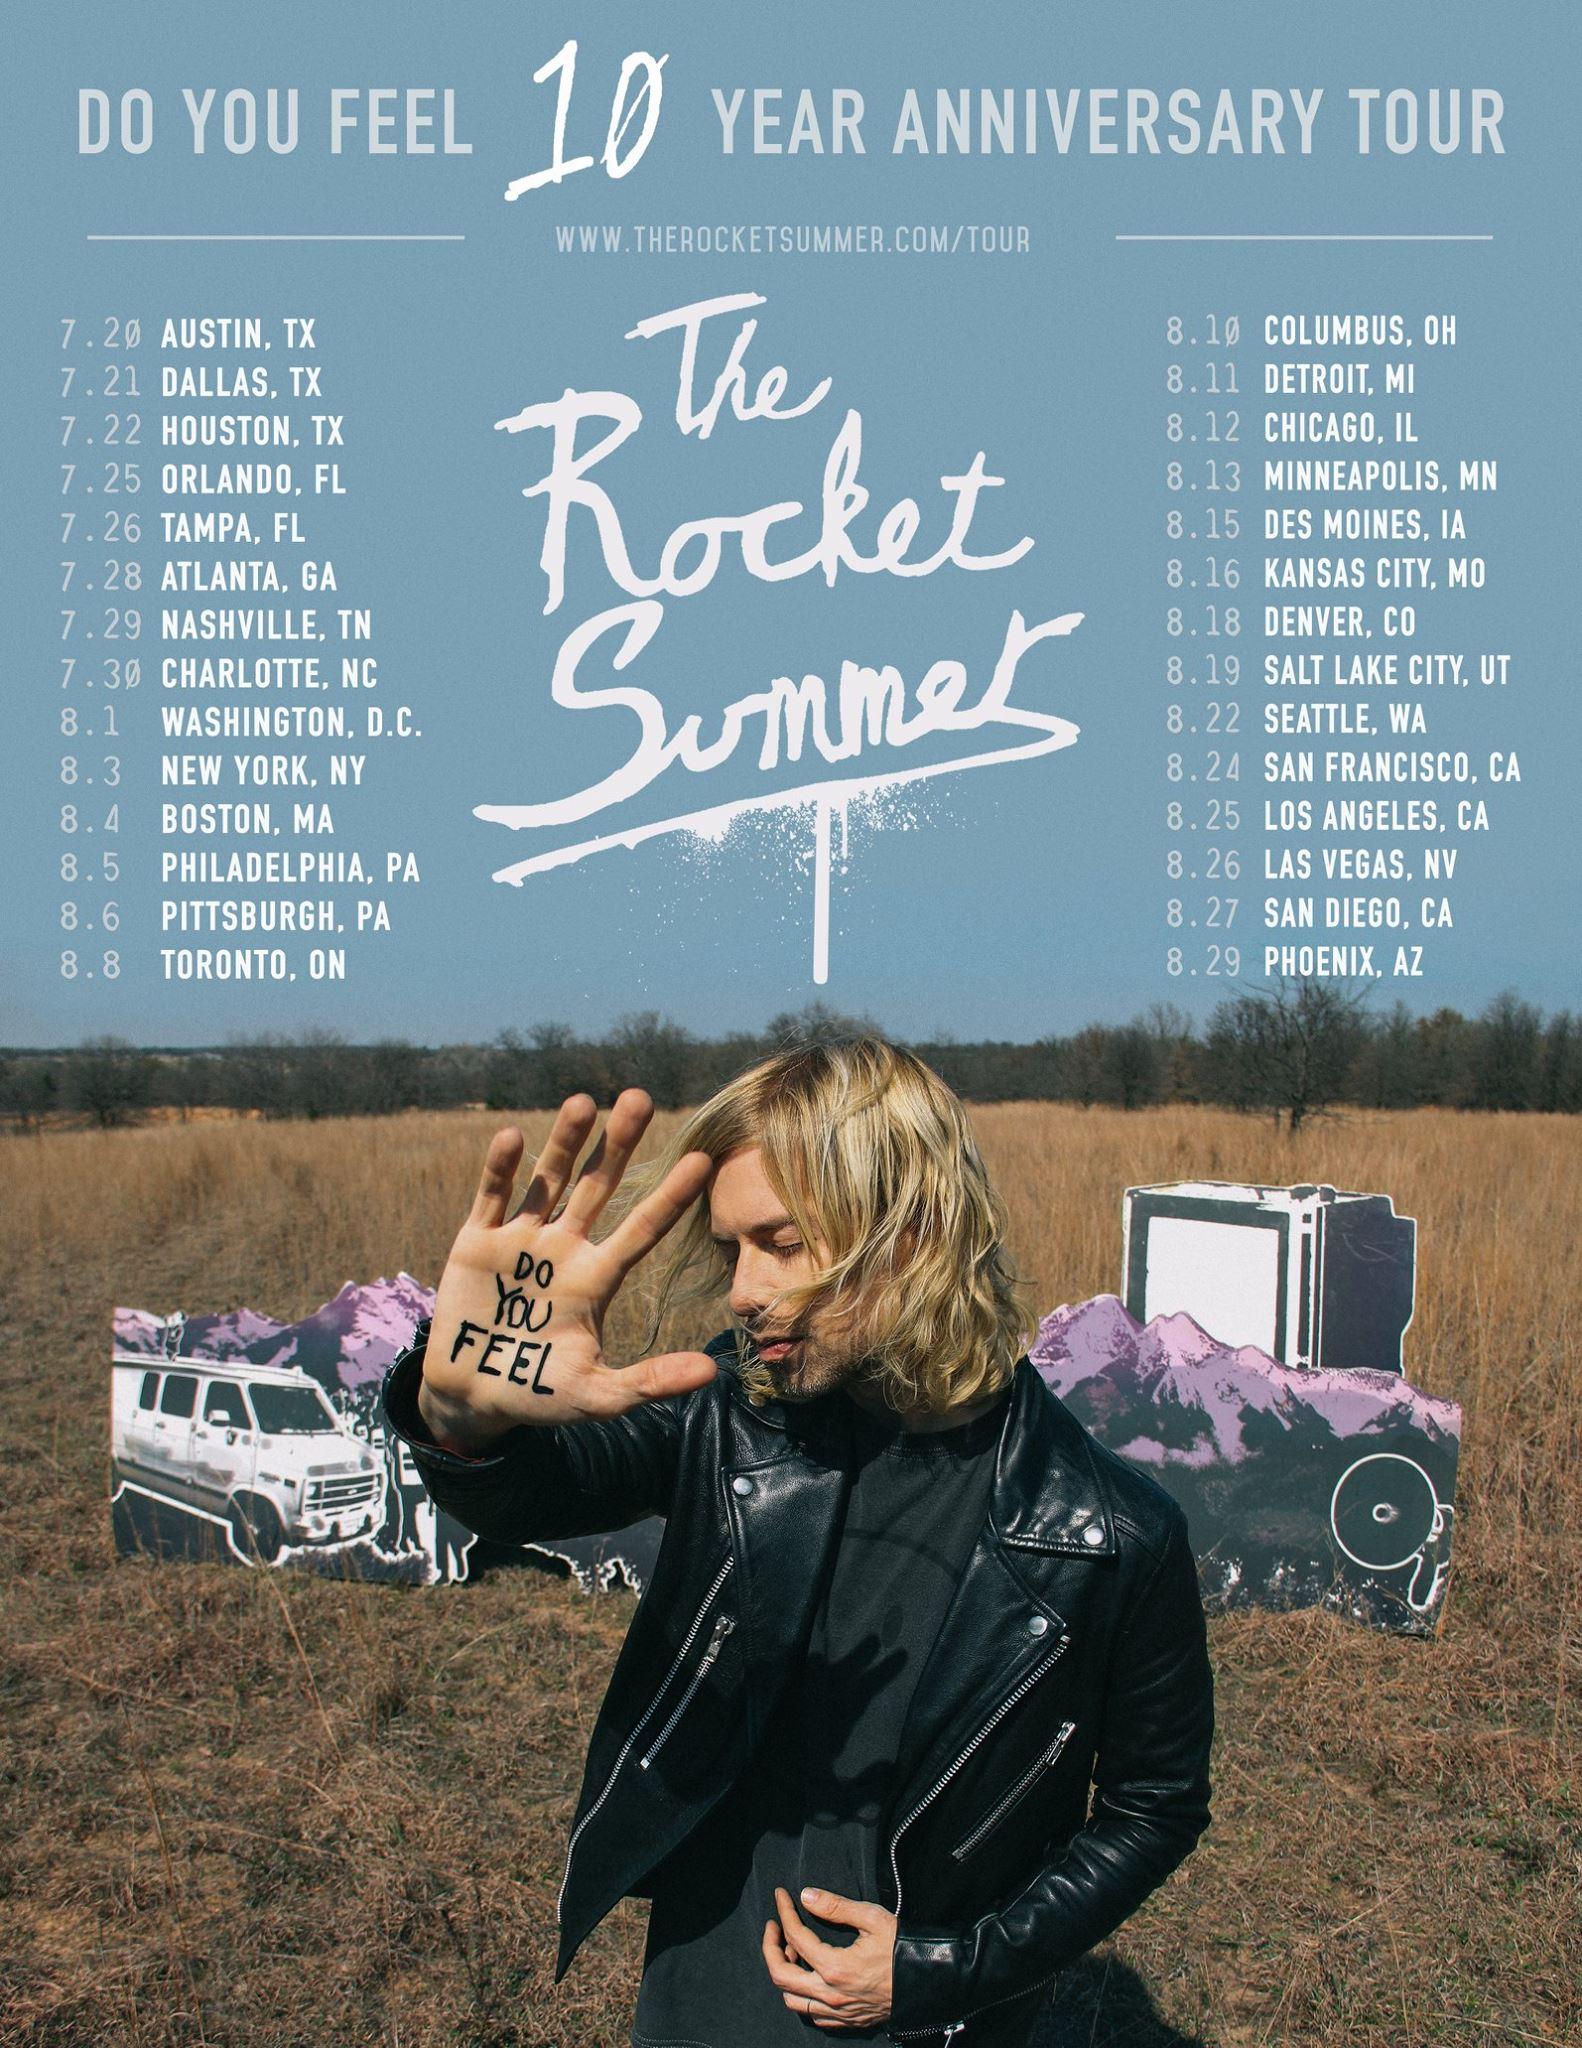 the_rocket_summer_do_you_feel.jpg